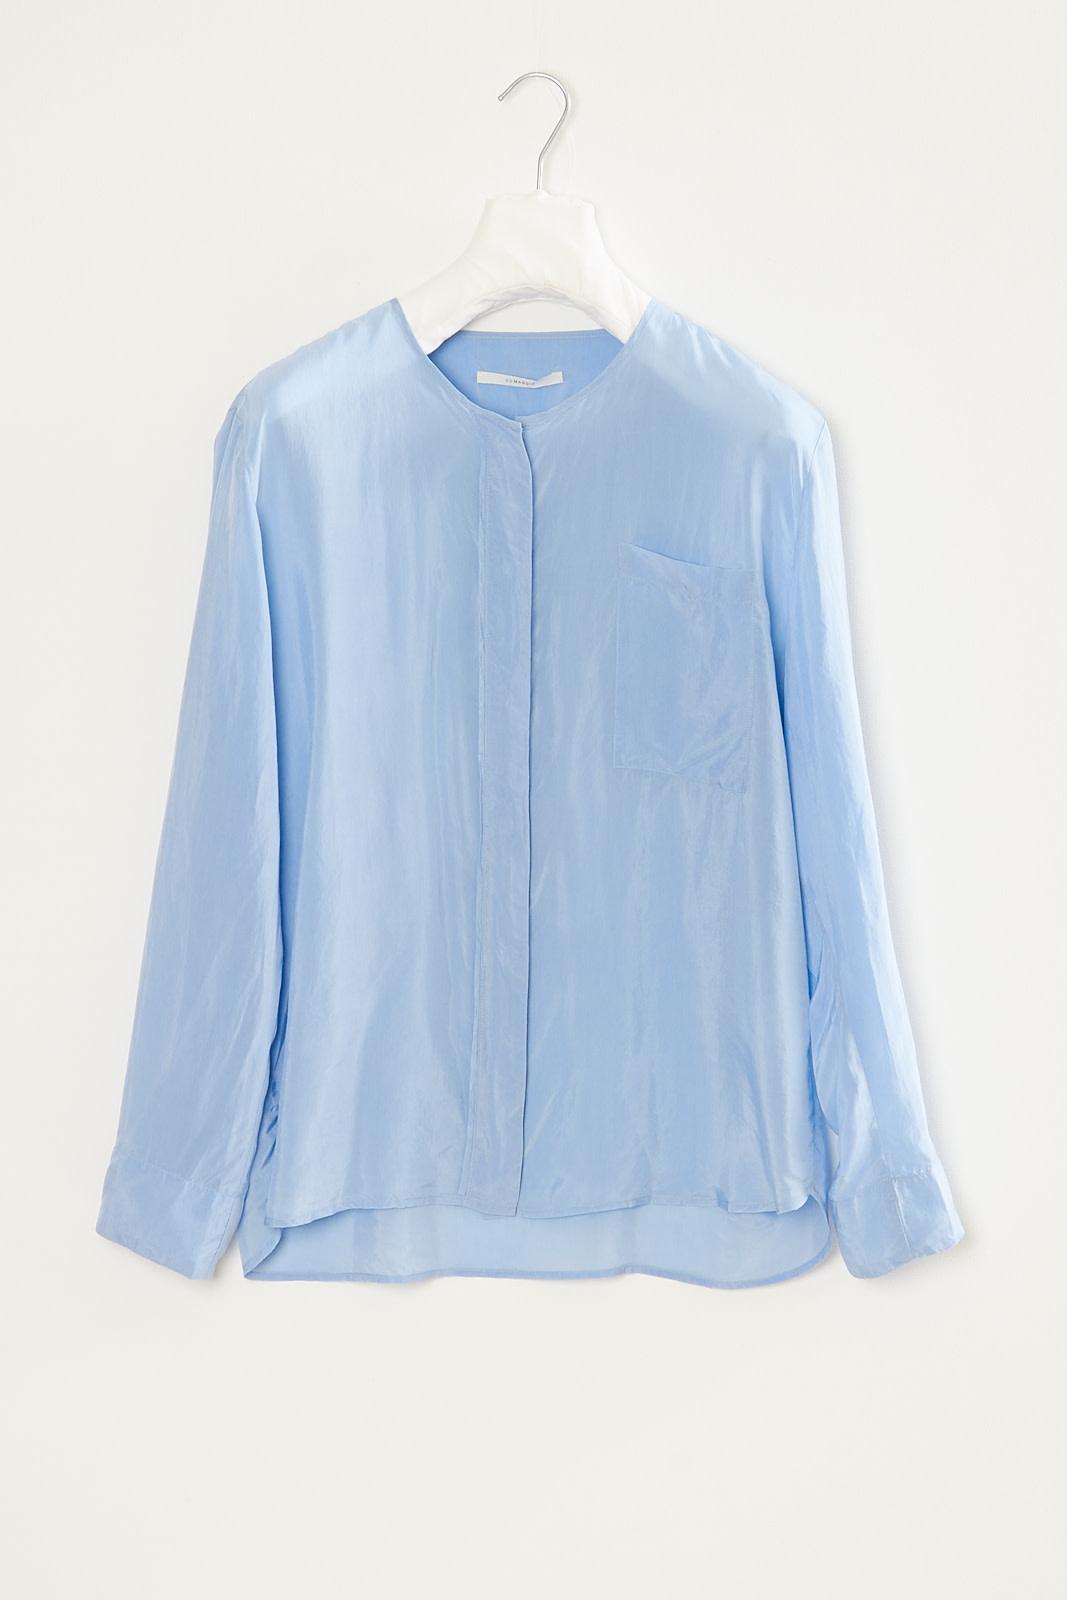 Humanoid - Filyn fair blouse